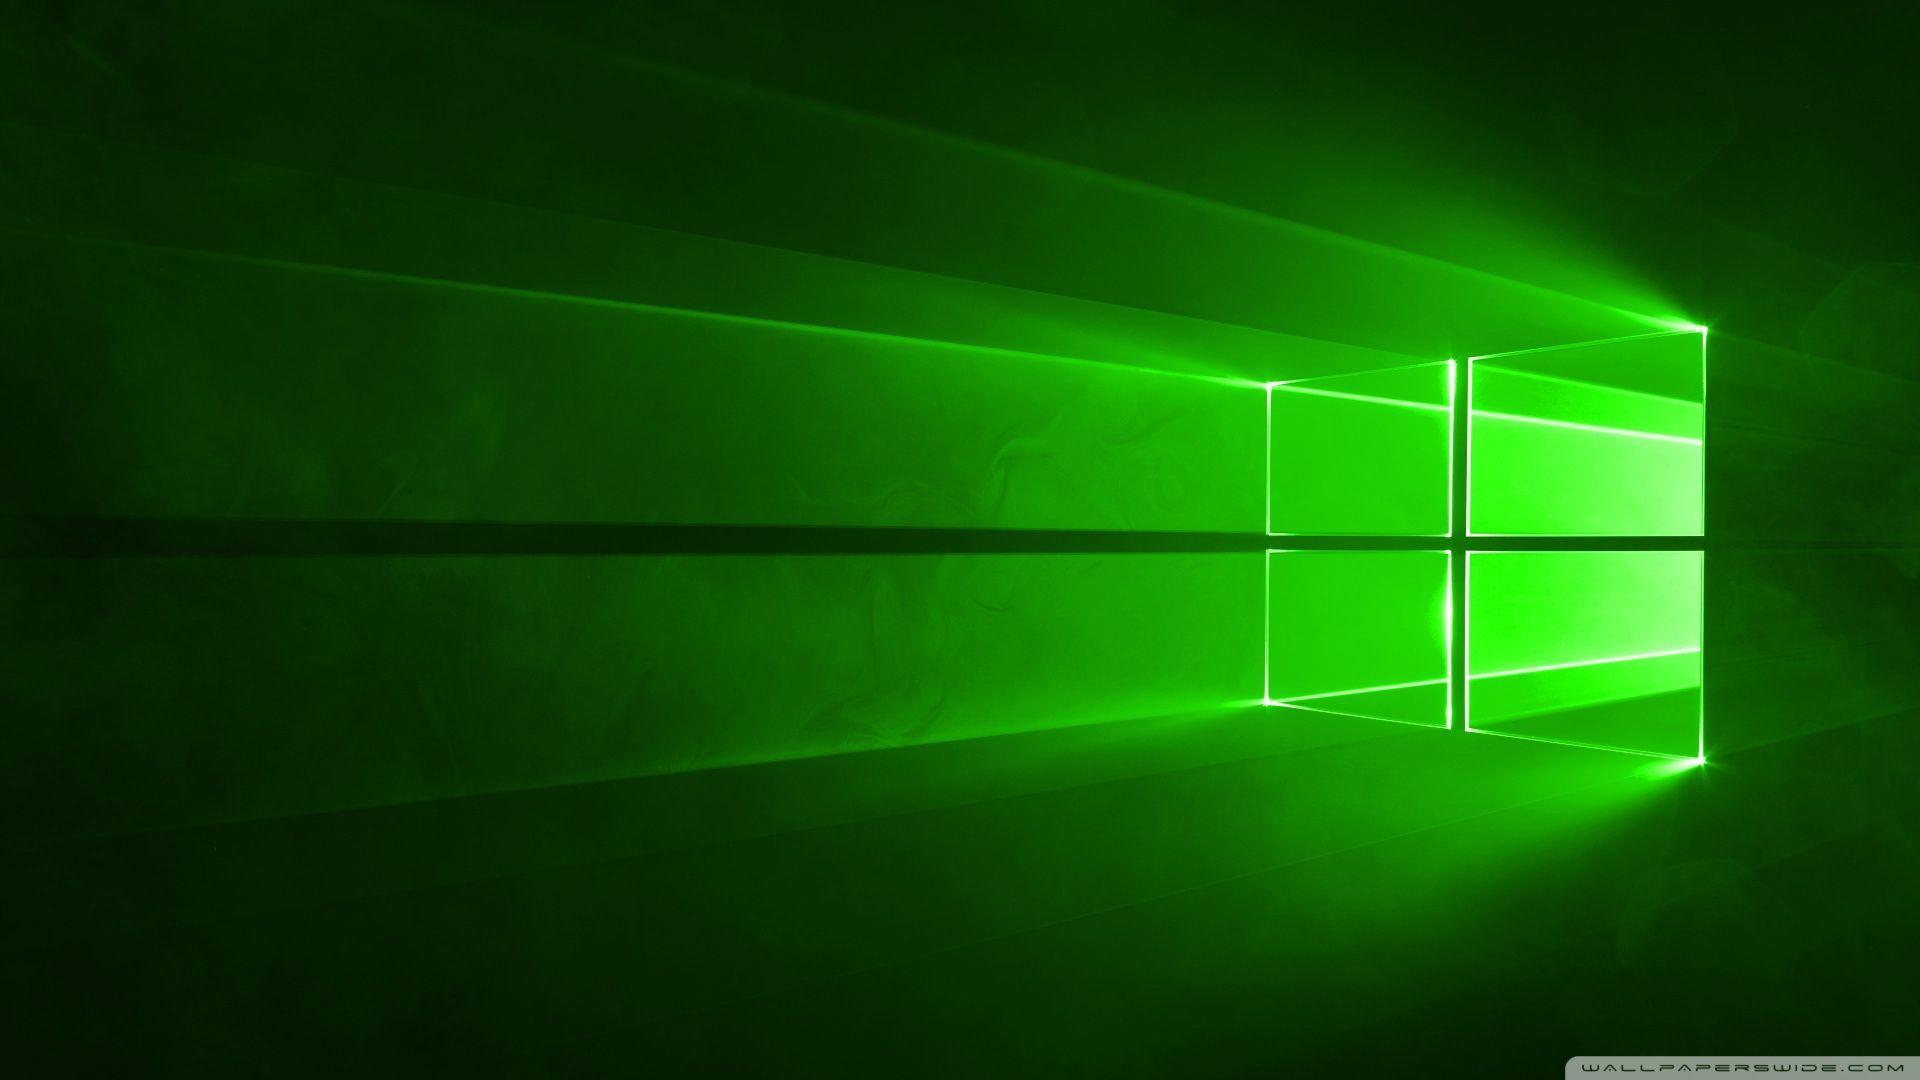 Nvidia green wallpapers top free nvidia green - 1920x1080 wallpaper nvidia ...